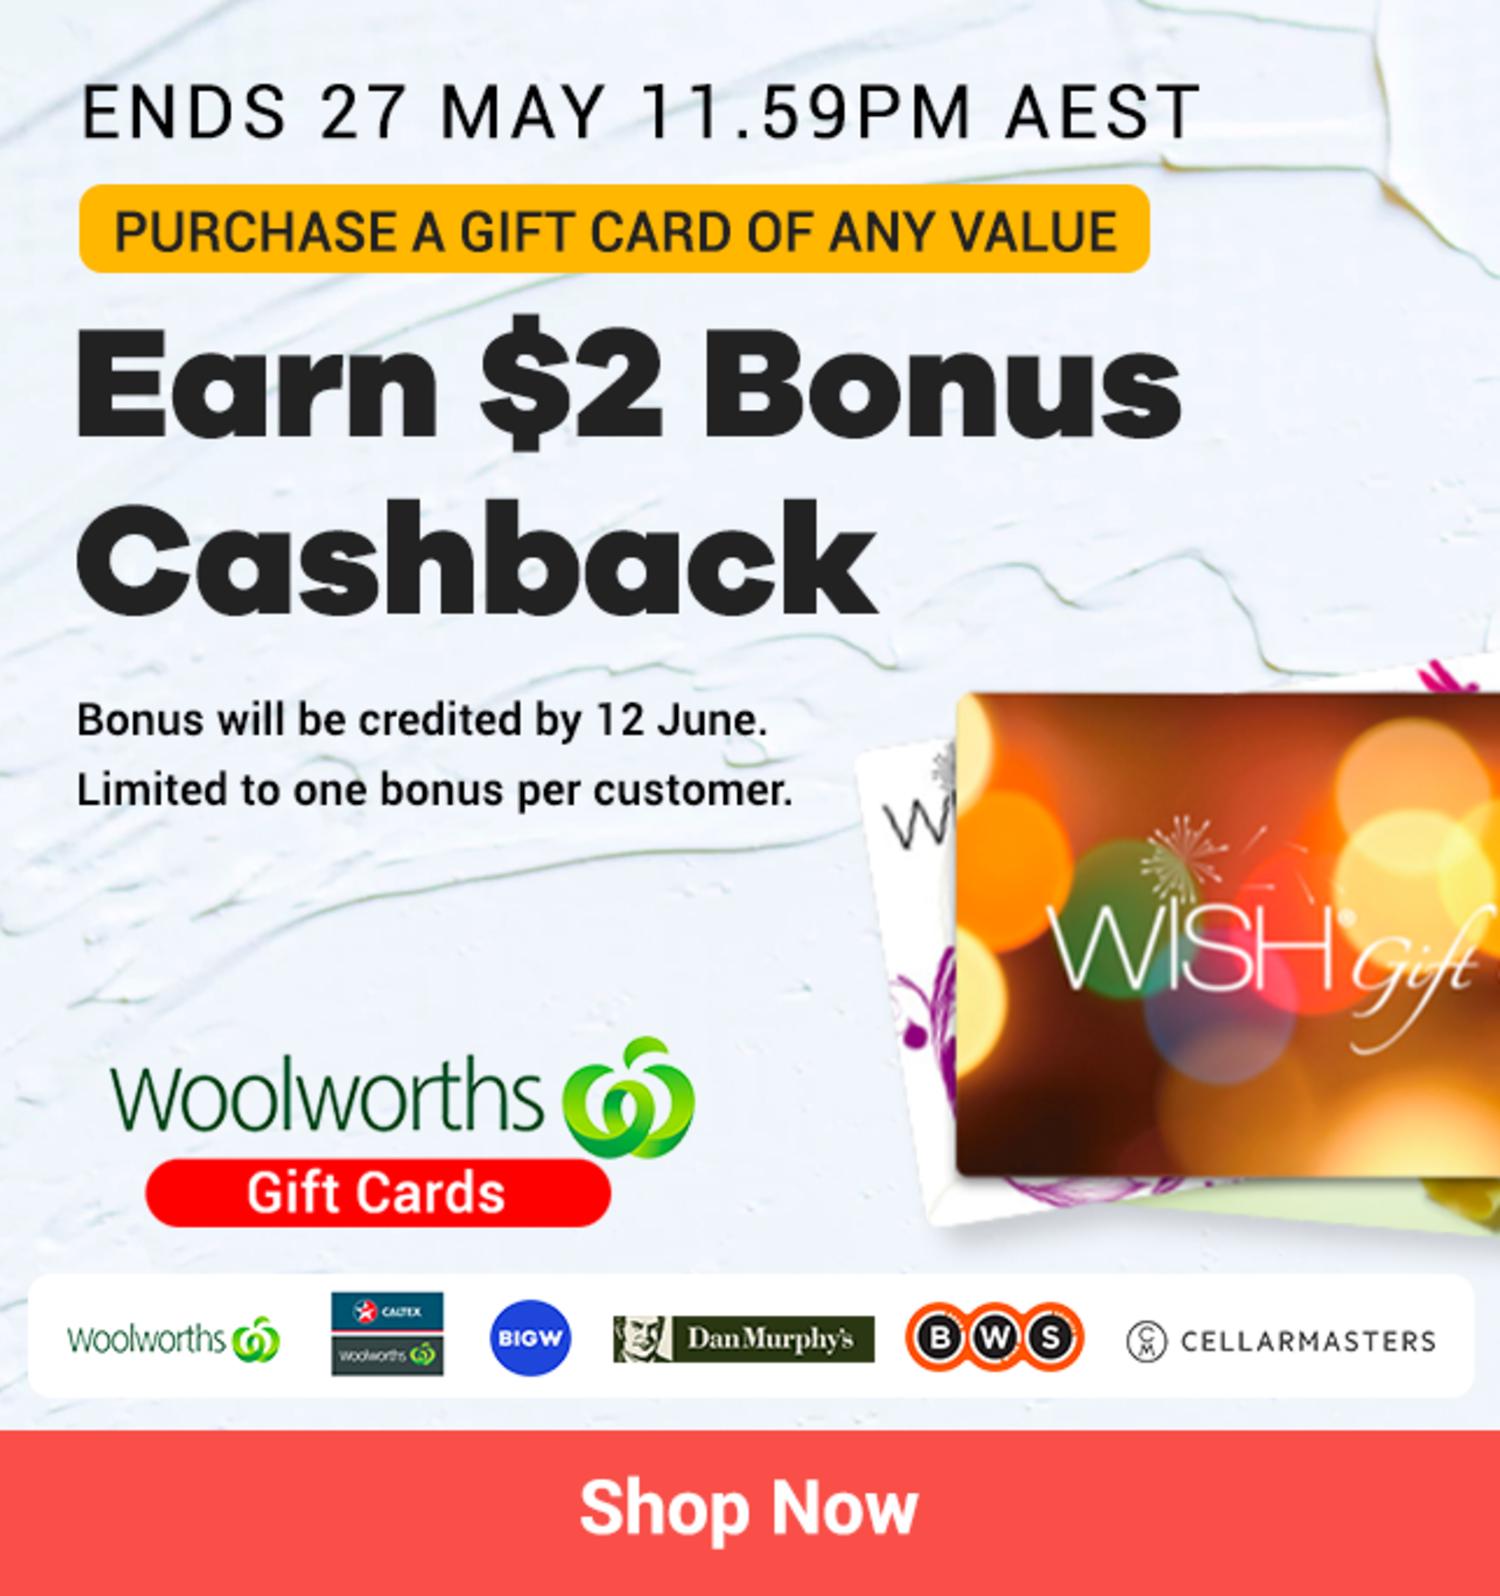 Woolworths Gift Cards - $2 Bonus